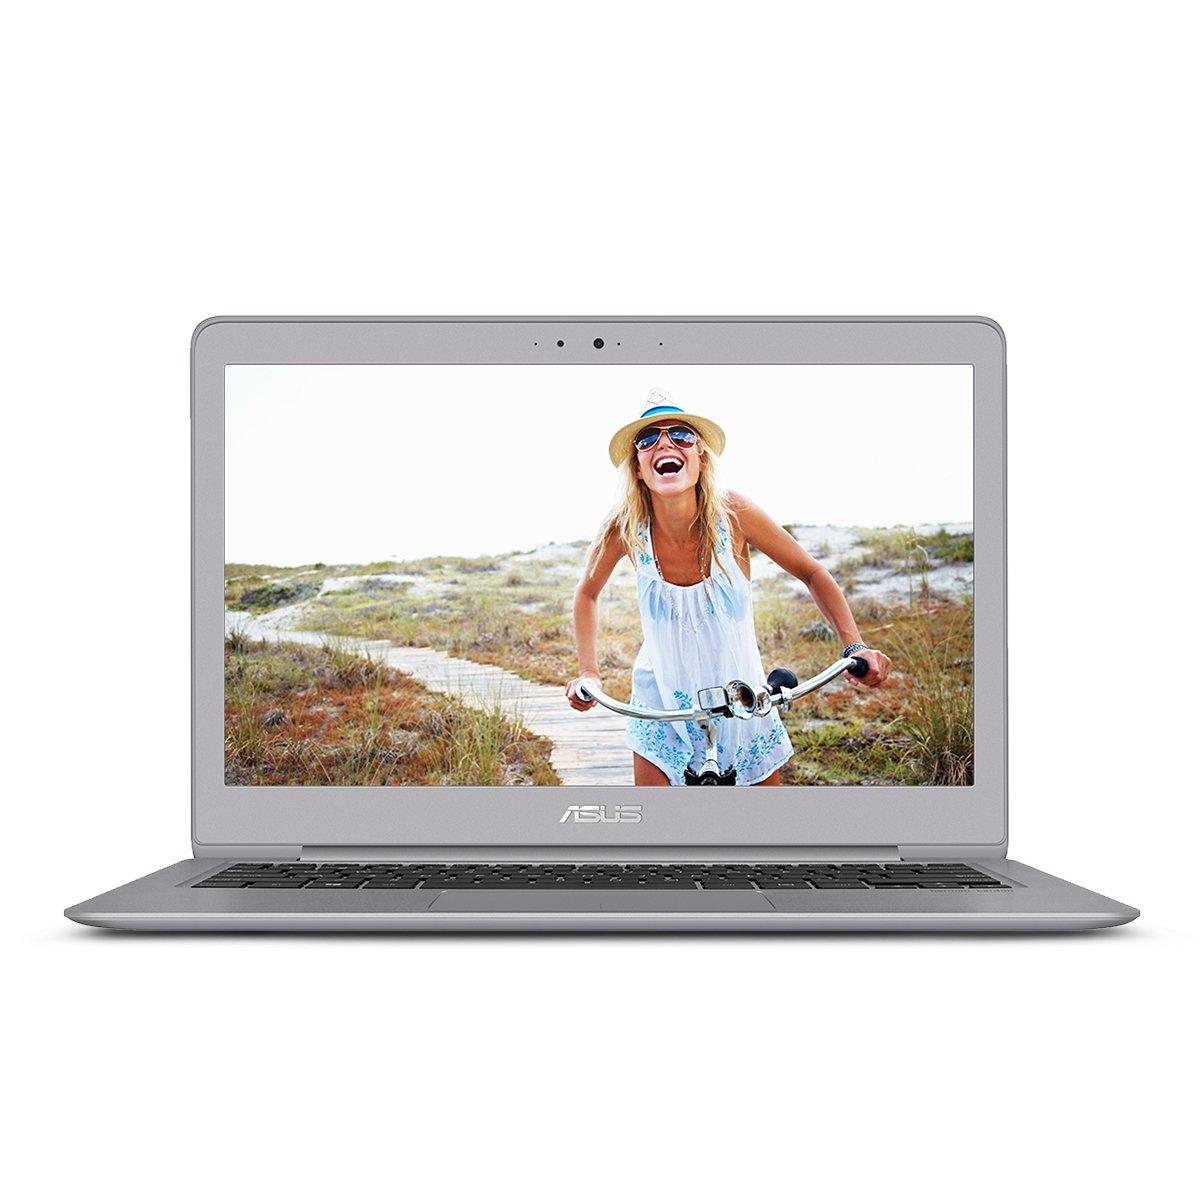 ASUS ZenBook UX330UA-AH54 13.3-inch LCD Ultra-Slim Laptop (Core i5 Processor, 8GB DDR3, 256GB SSD, Windows 10) w/ Harman Kardon Audio, Backlit keyboard, Fingerprint Reader by Asus (Image #1)